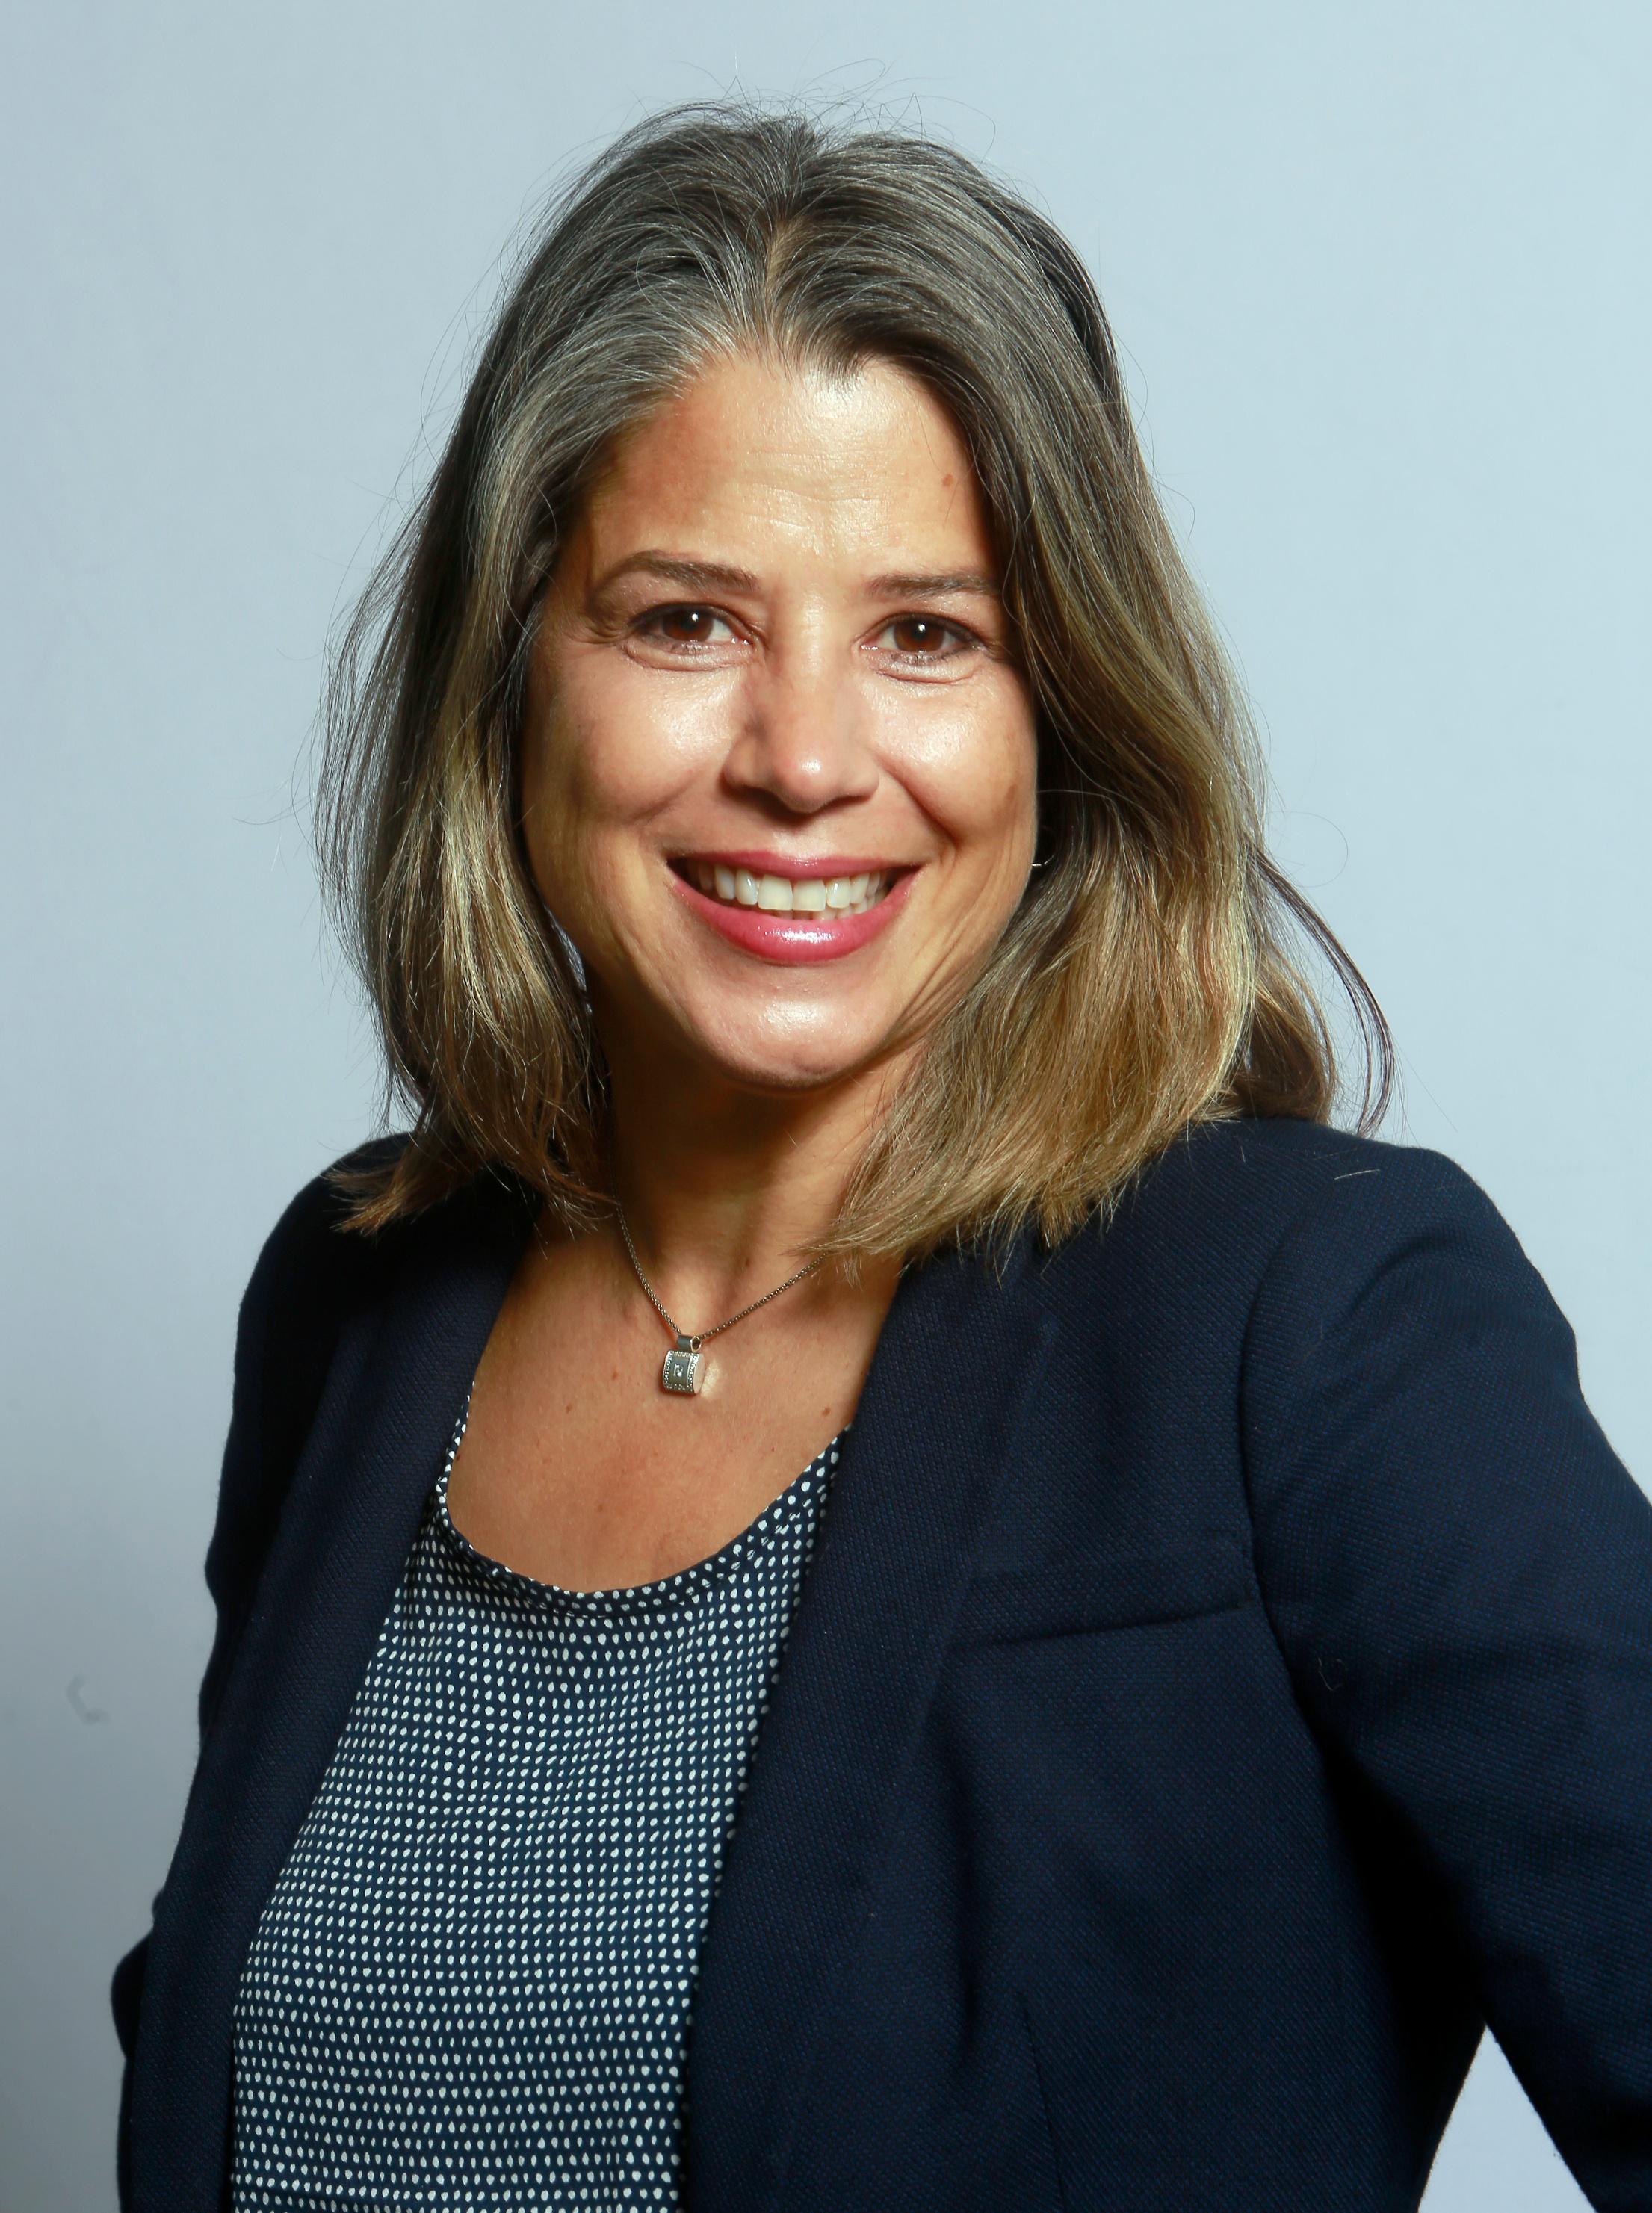 Maria Ceballos-Wallis